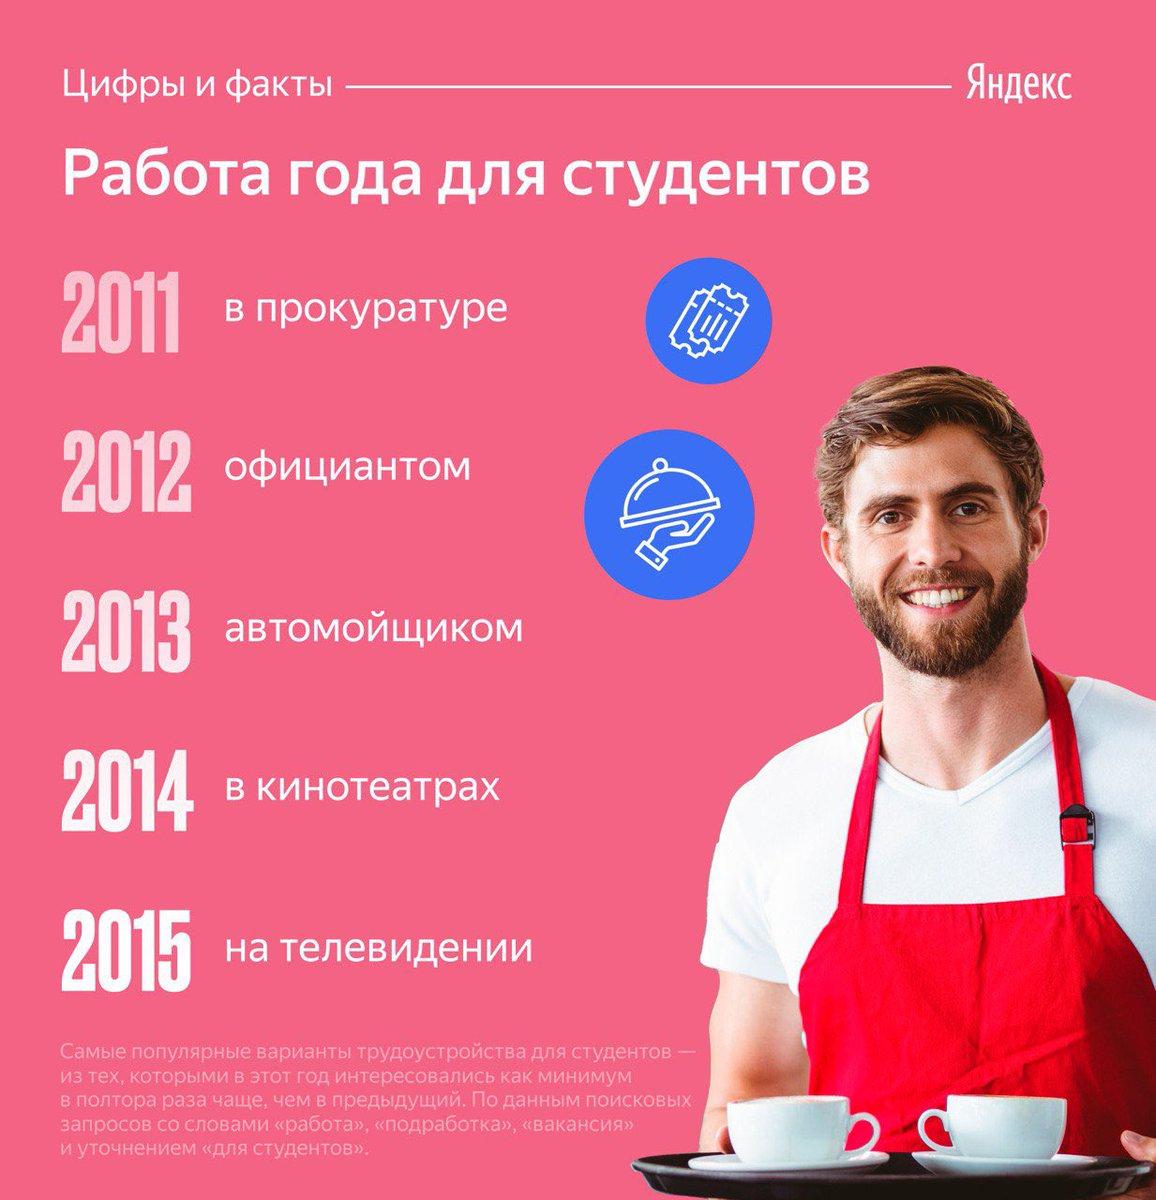 Работа спб вакансии программист удаленно freelance one ru